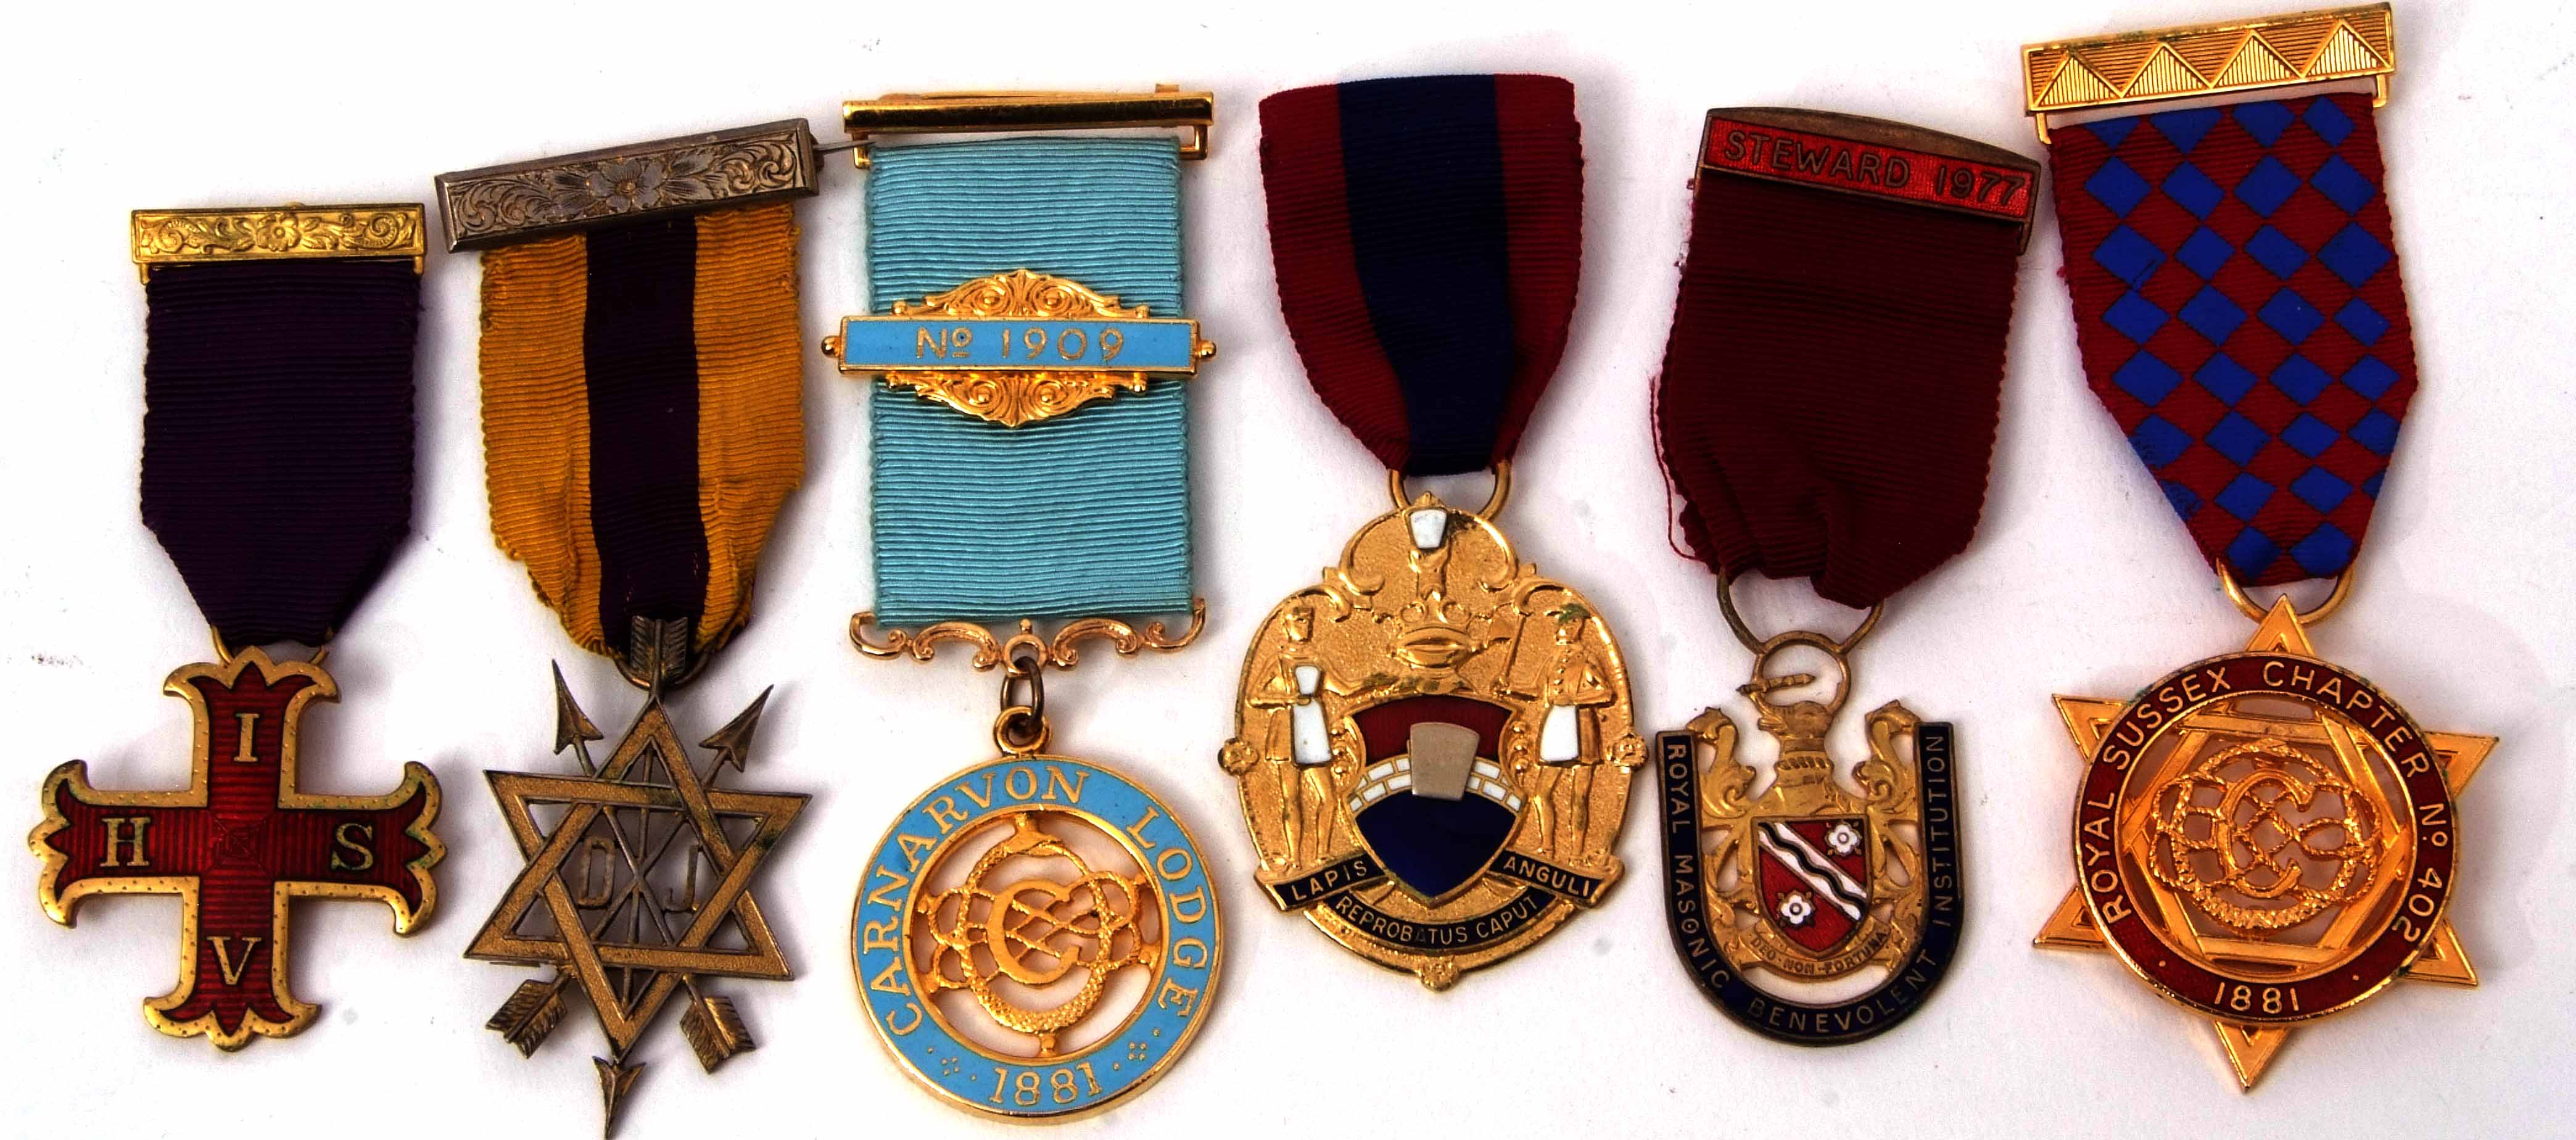 Lot 585 - Mixed Lot: six various base metal Masonic jewels including Order of the Secret Monitor, Caernarvon